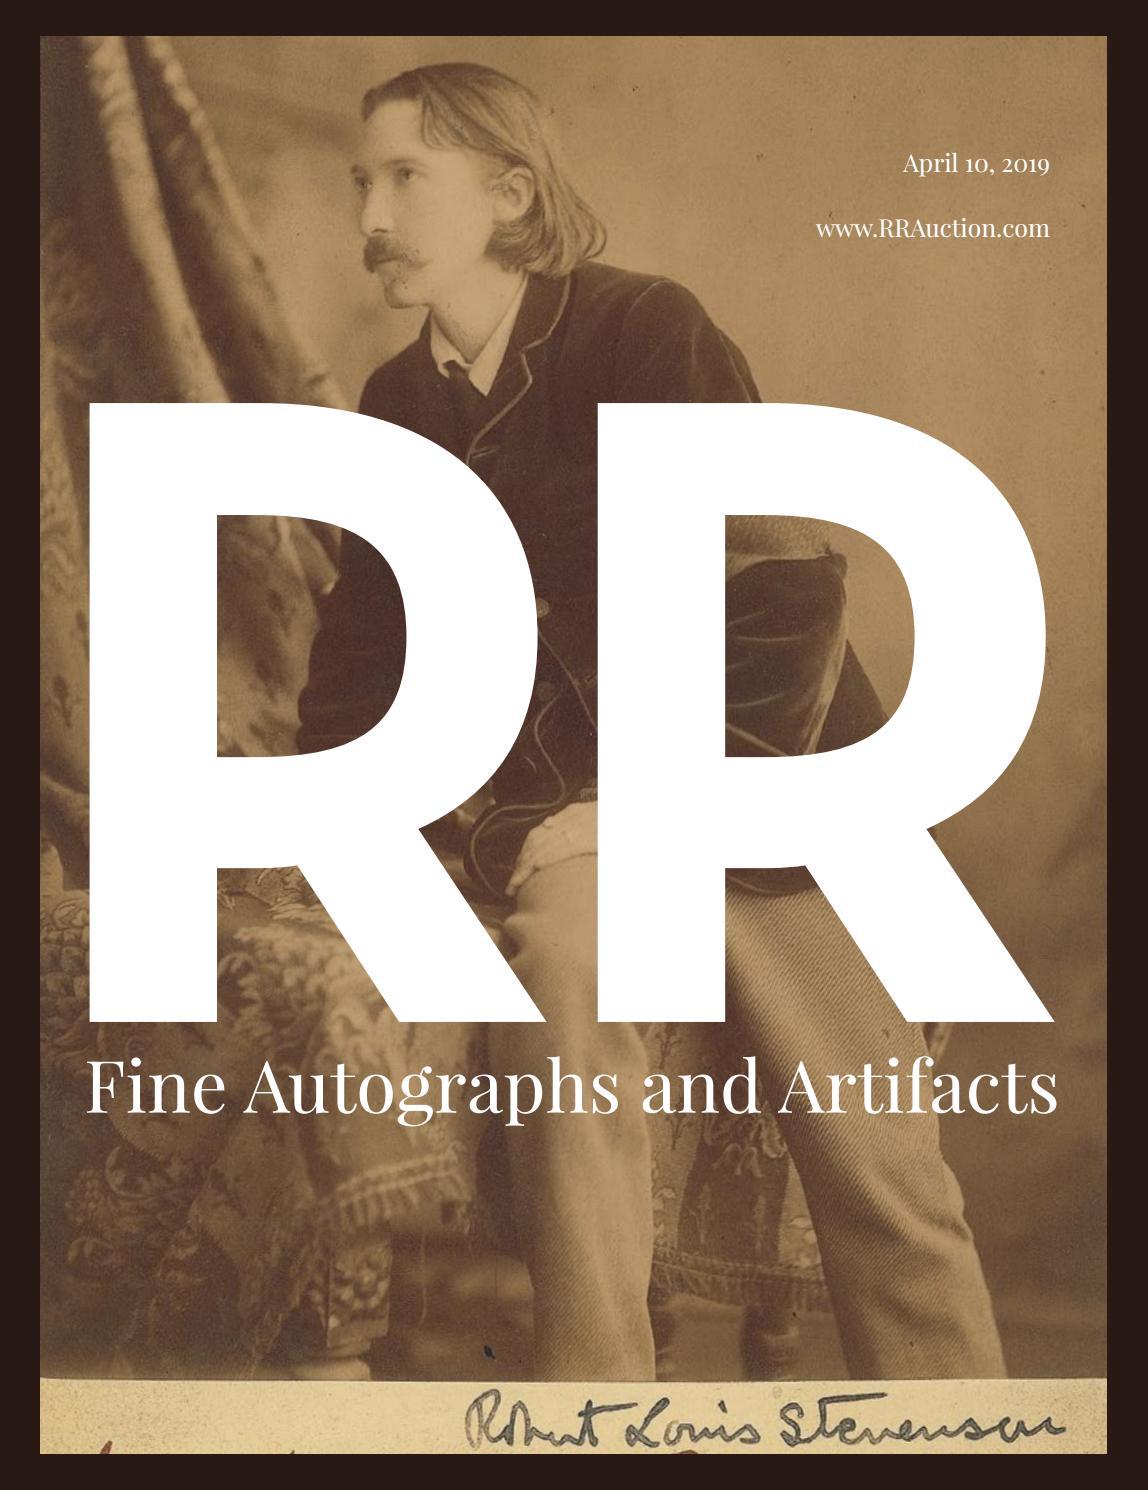 3613575e45d1 RR Auction  Fine Autographs and Artifacts featuring Pop Culture by ...